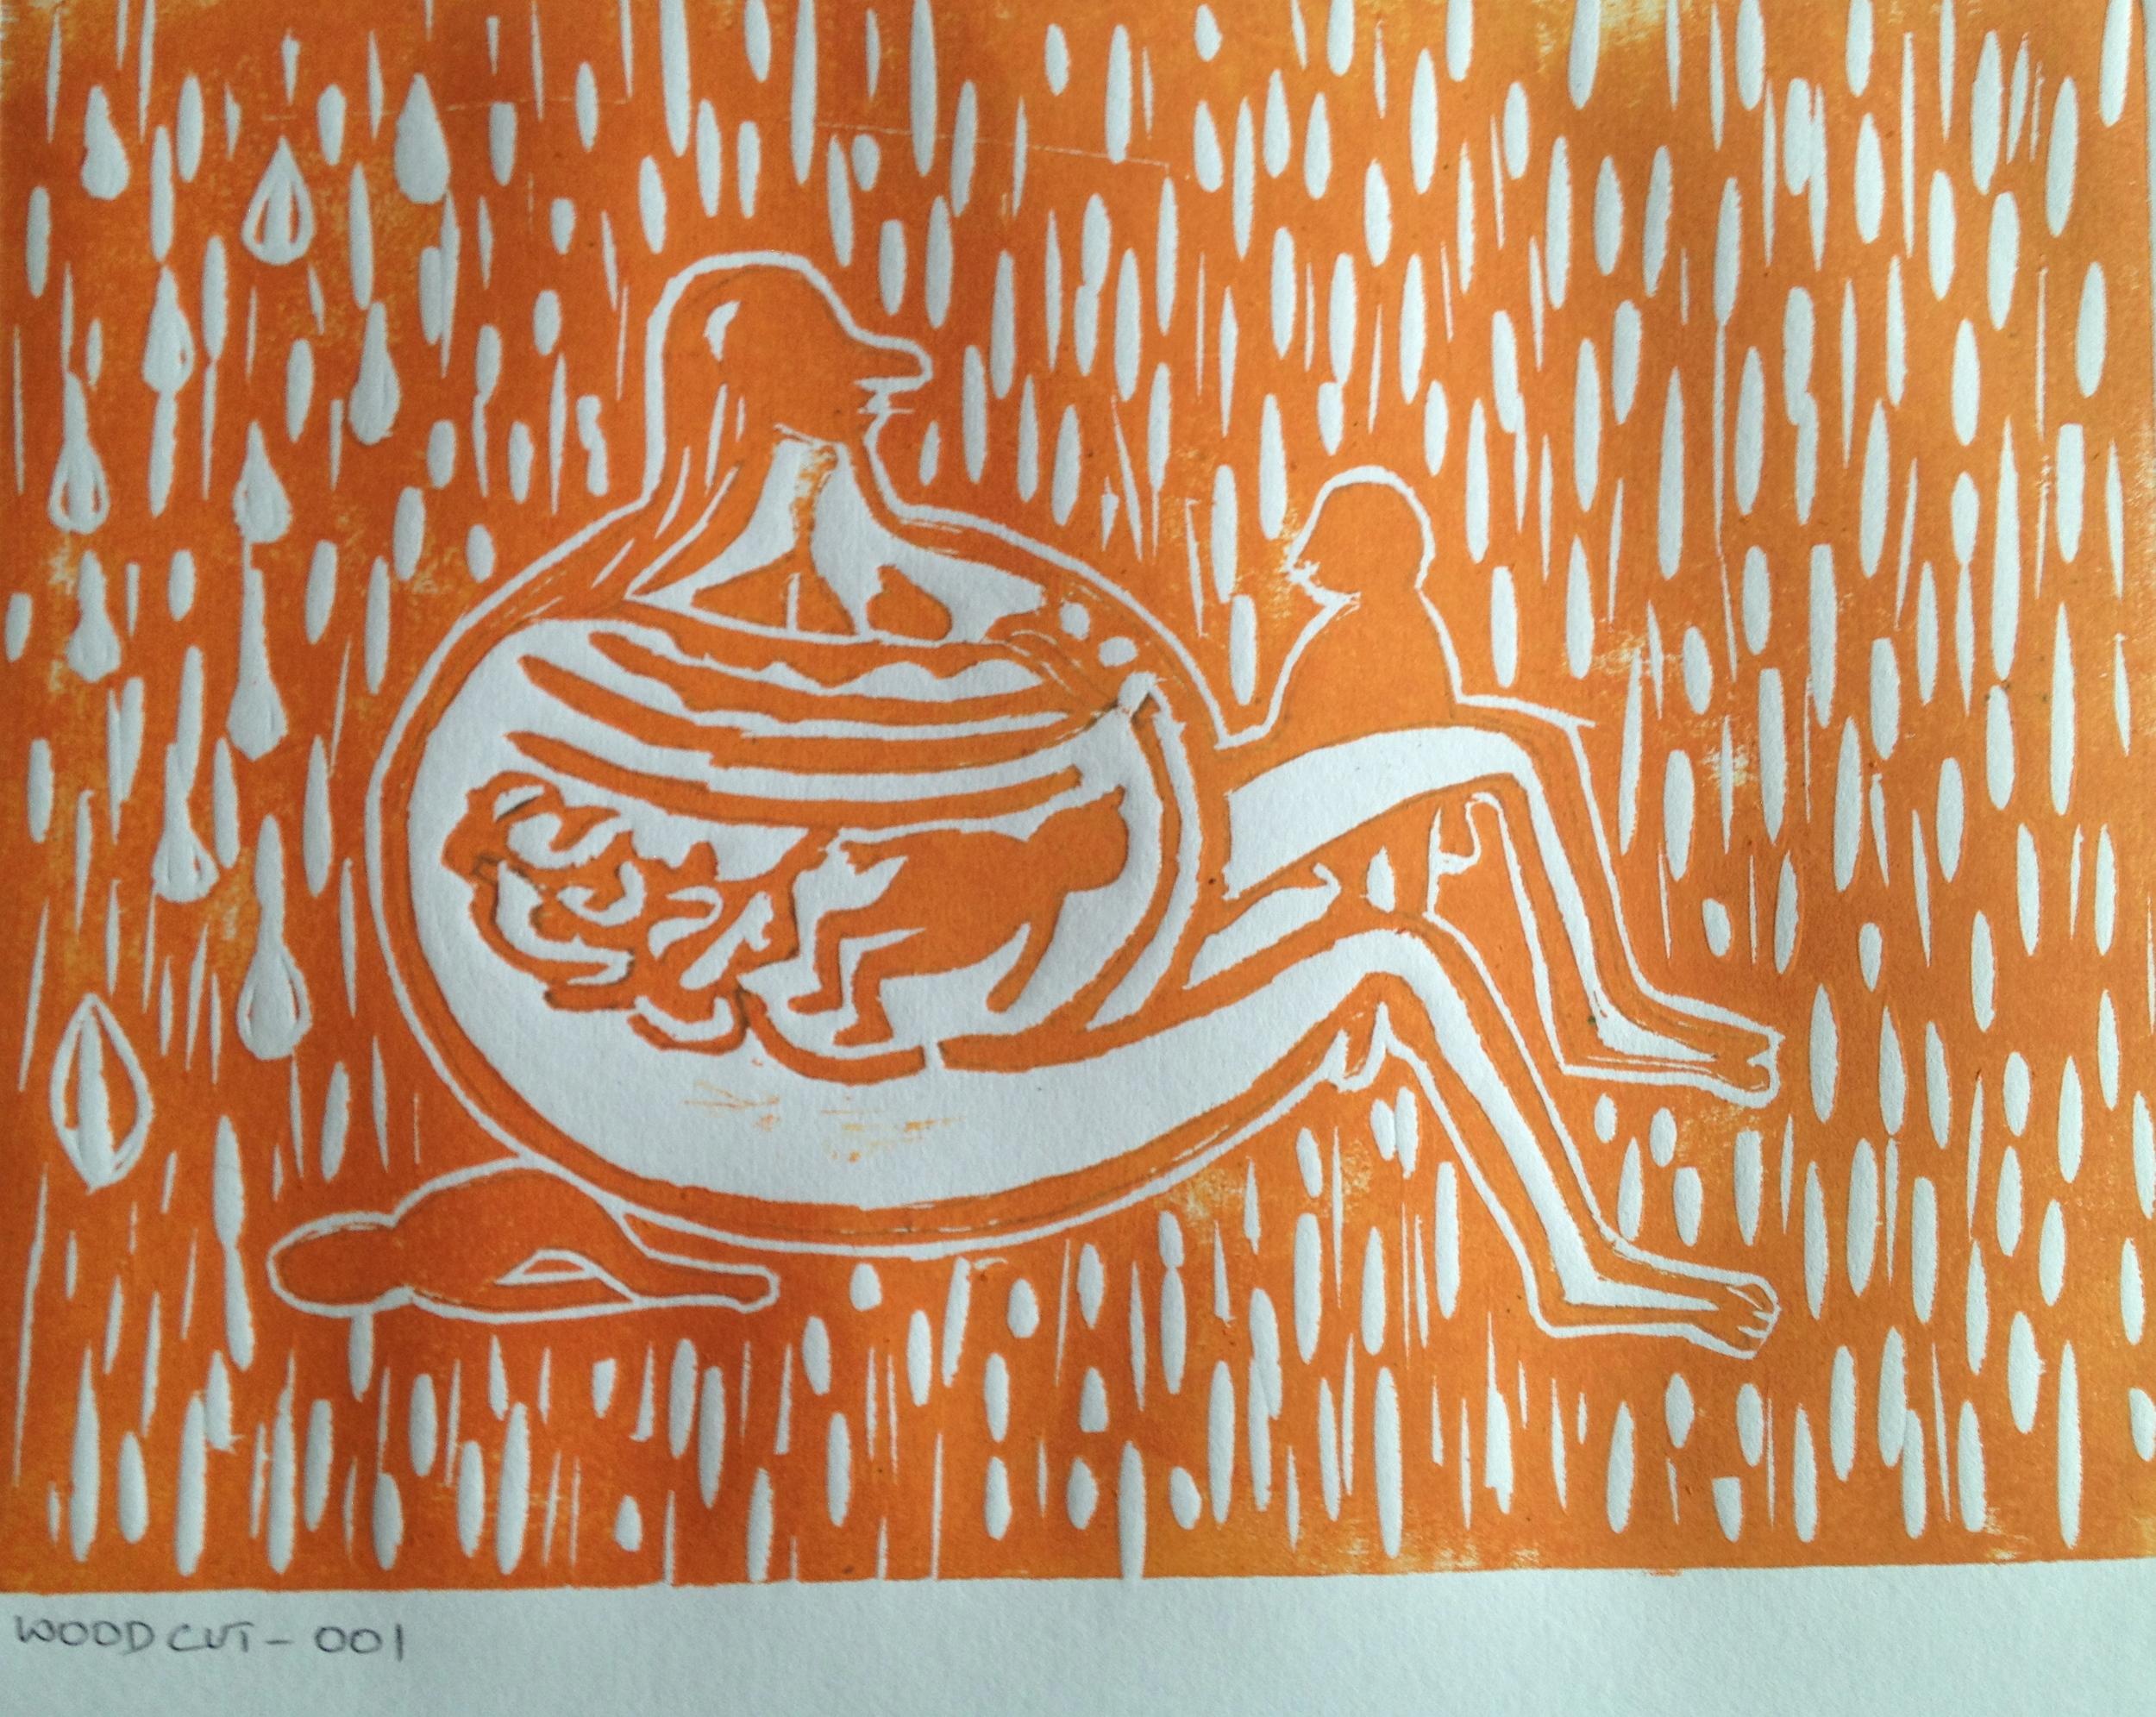 Untitled Wood Cut on Paper 42 x 59.4 cms 2013